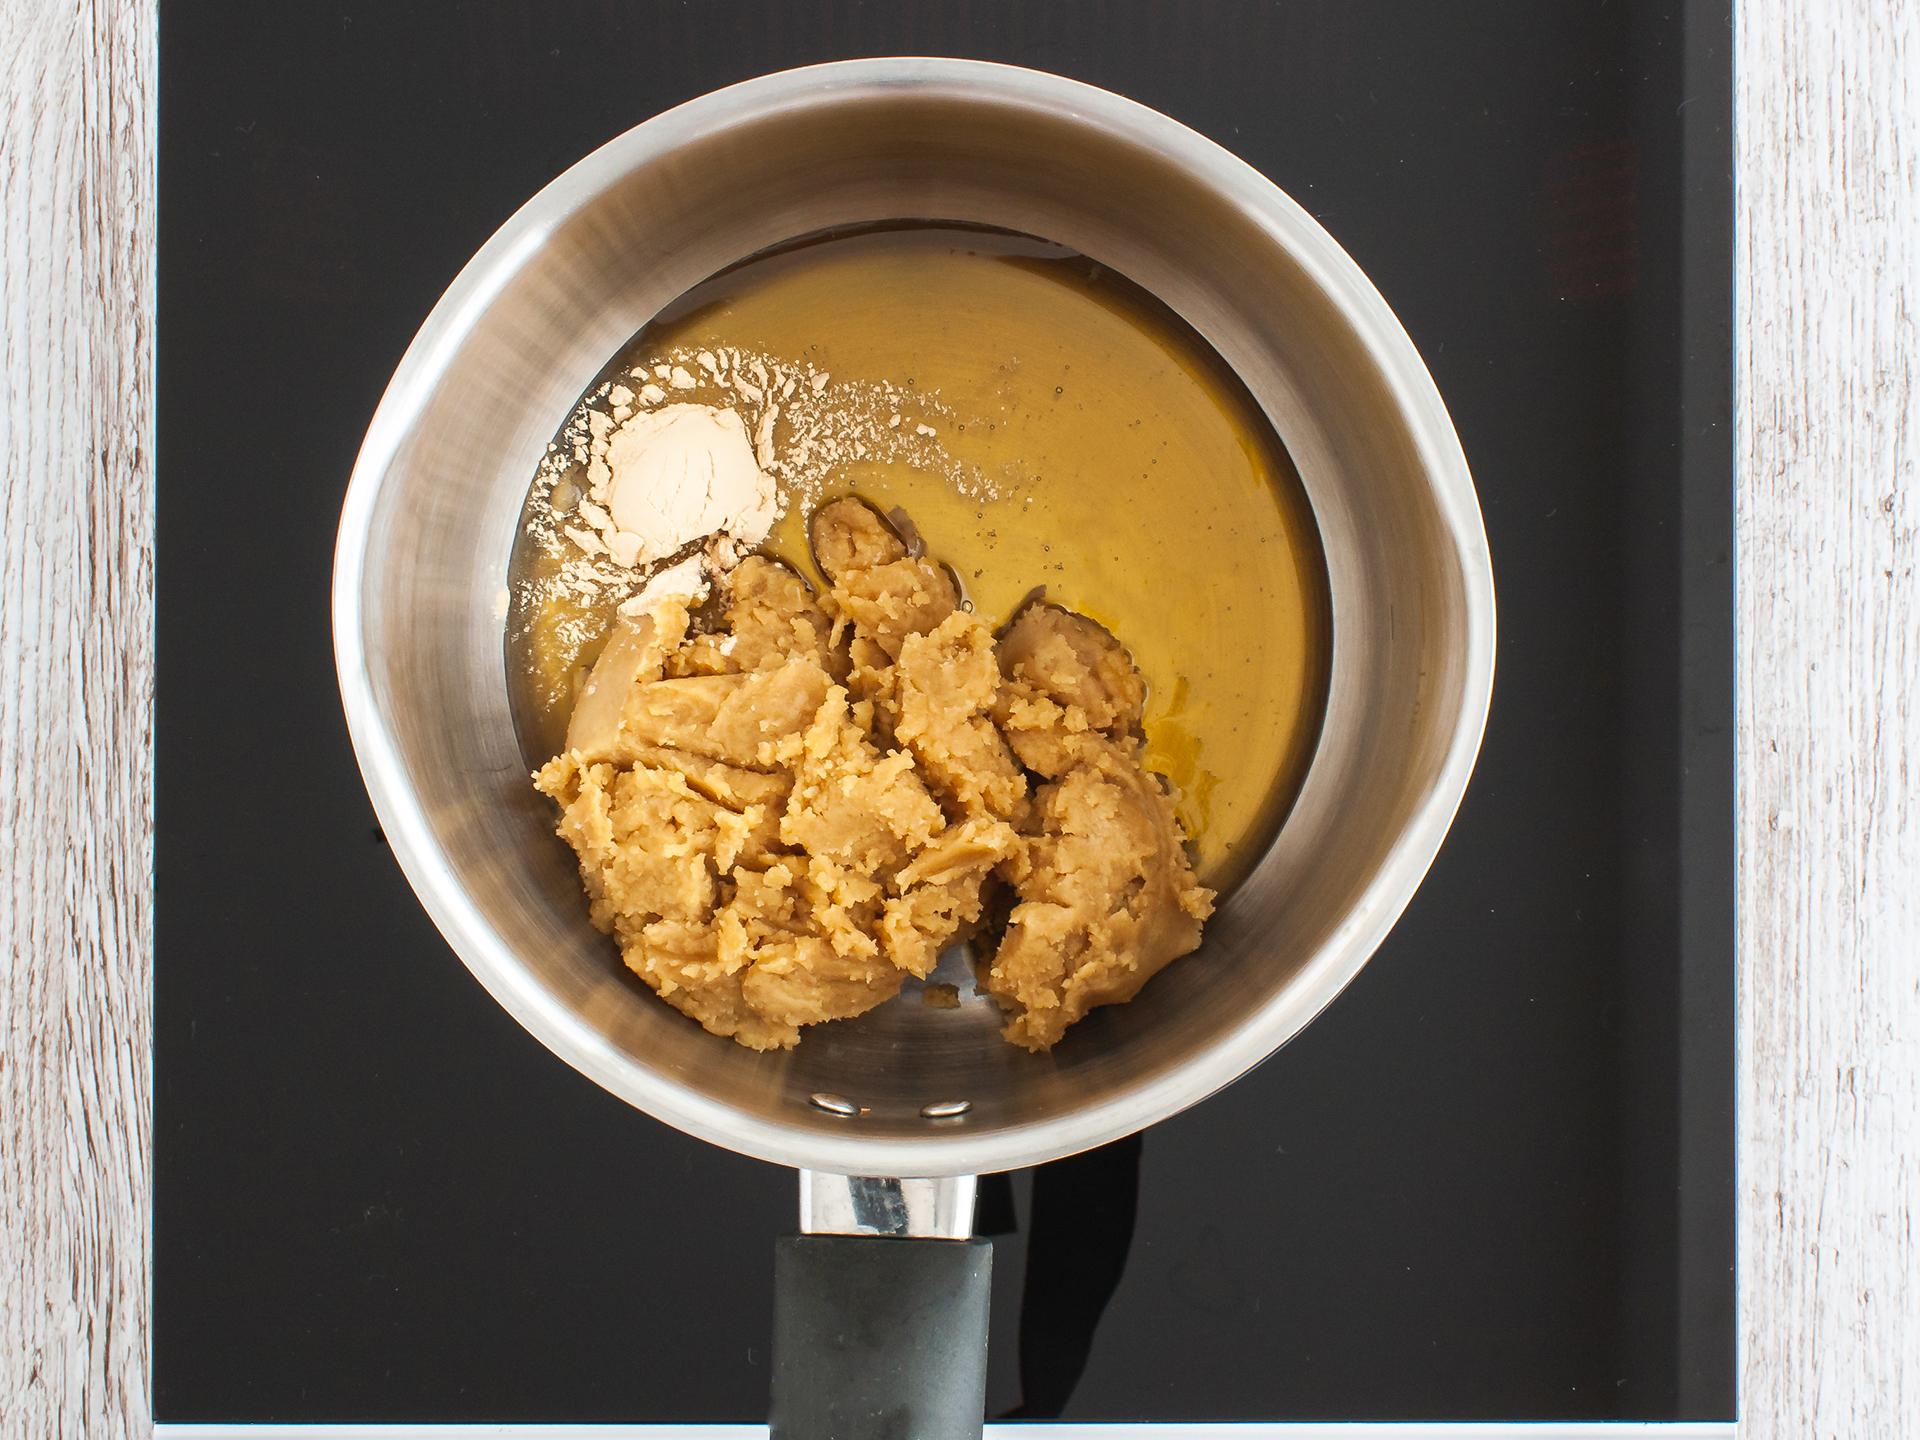 Step 1.1 of Sesame Puffed Rice Bars Recipe